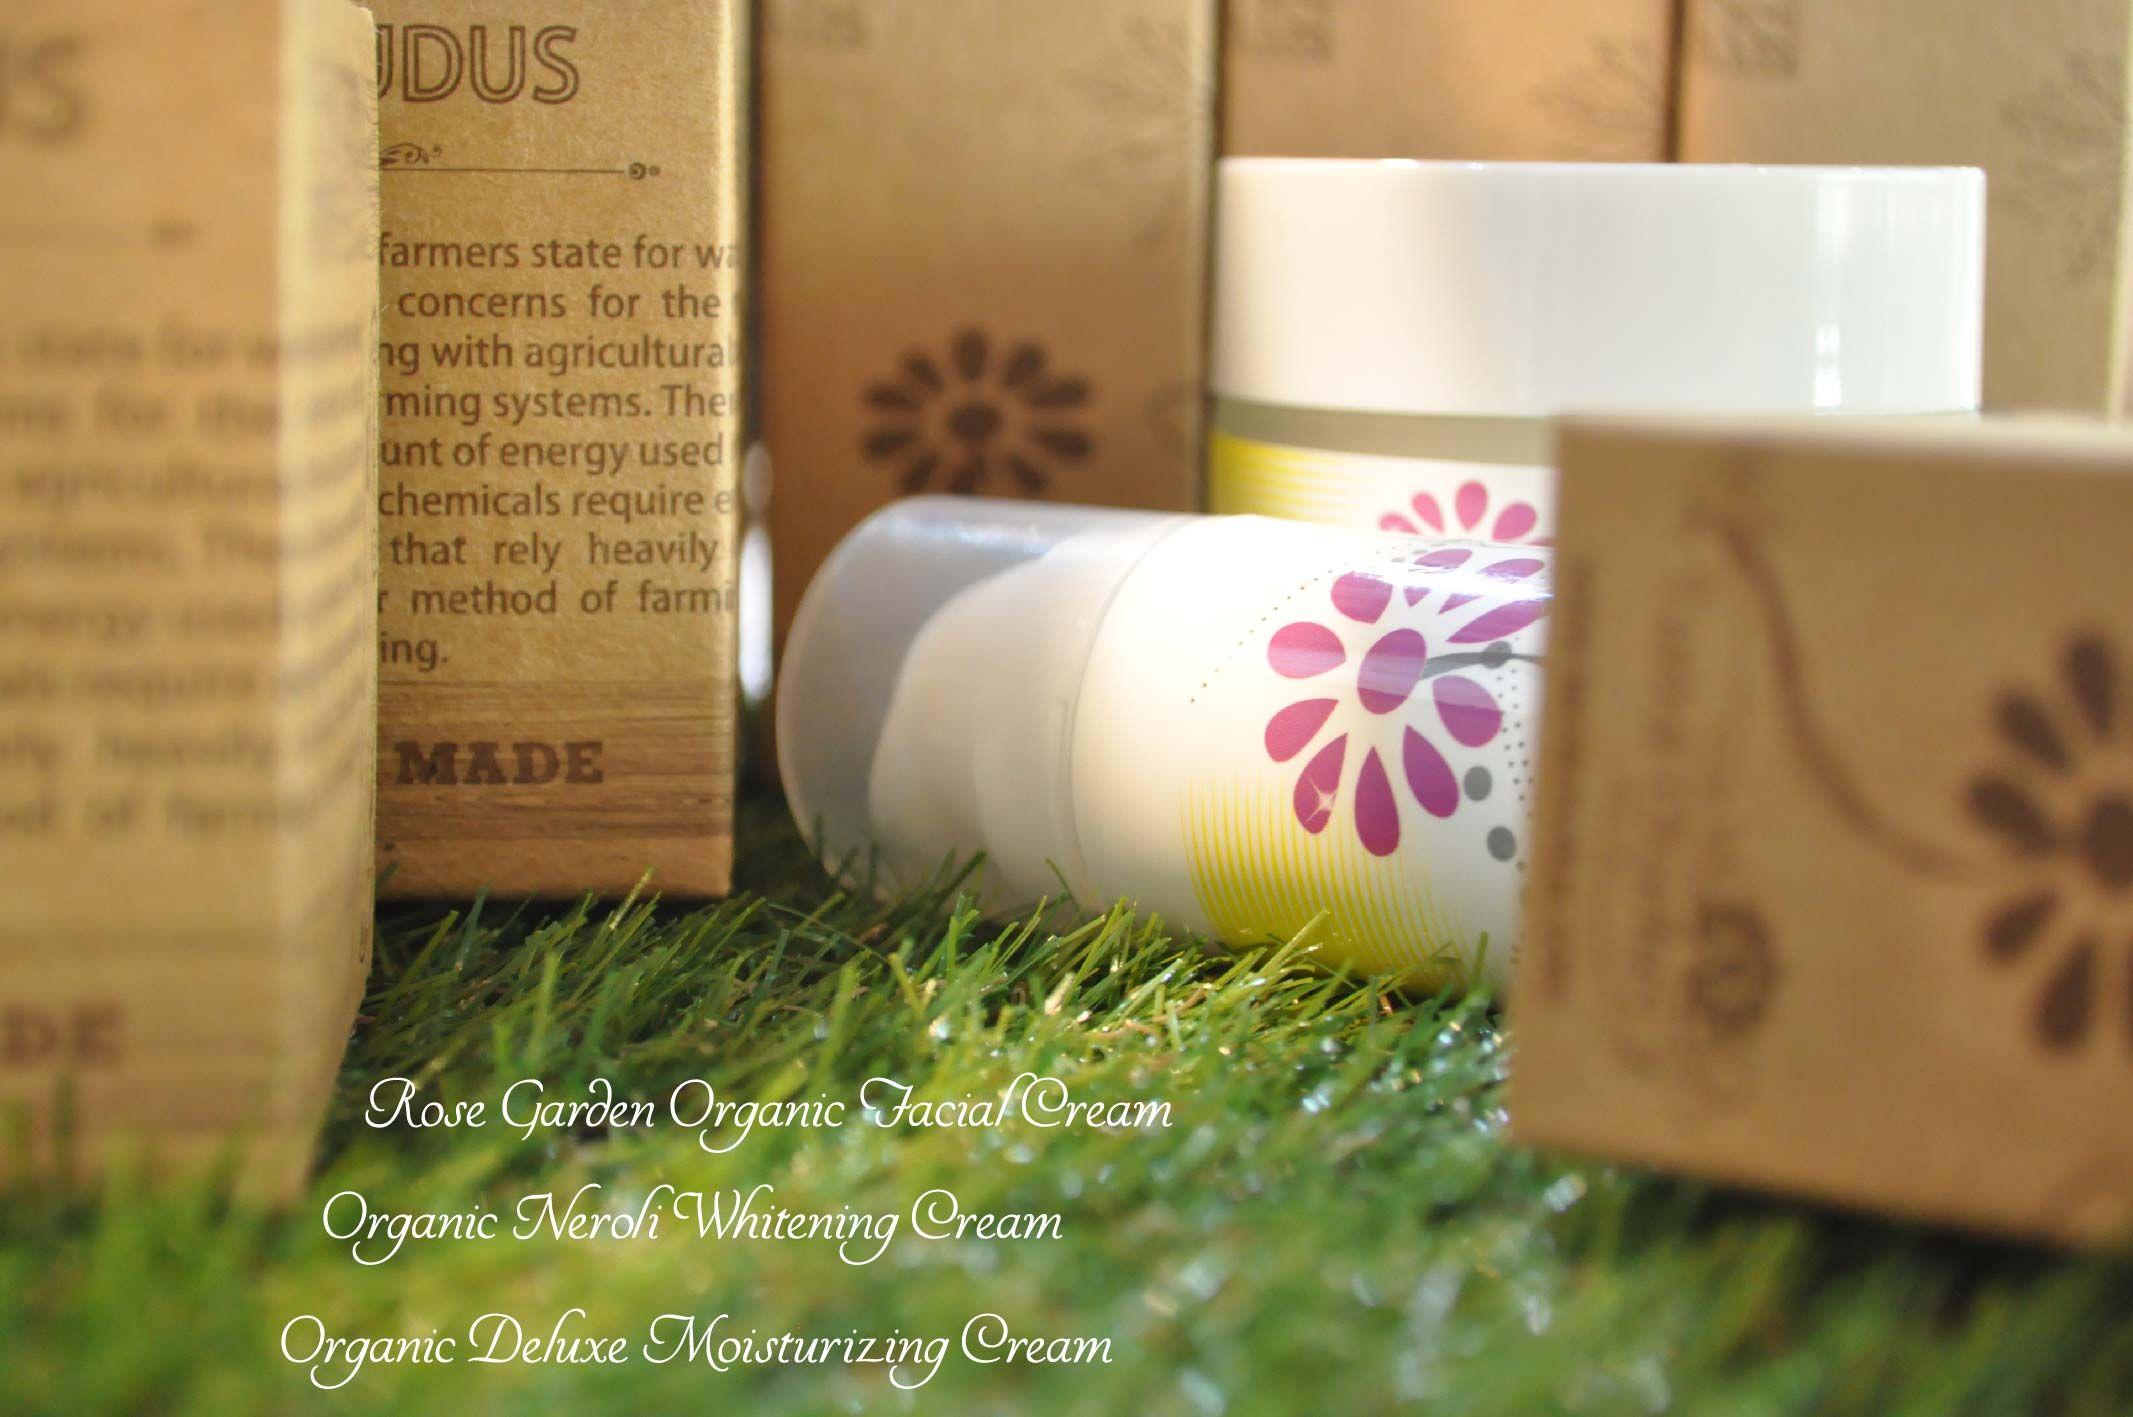 Pin by Terra Crudus 生活原機 on 產品介紹   Moisturizer cream. Shampoo bottle. Energy use